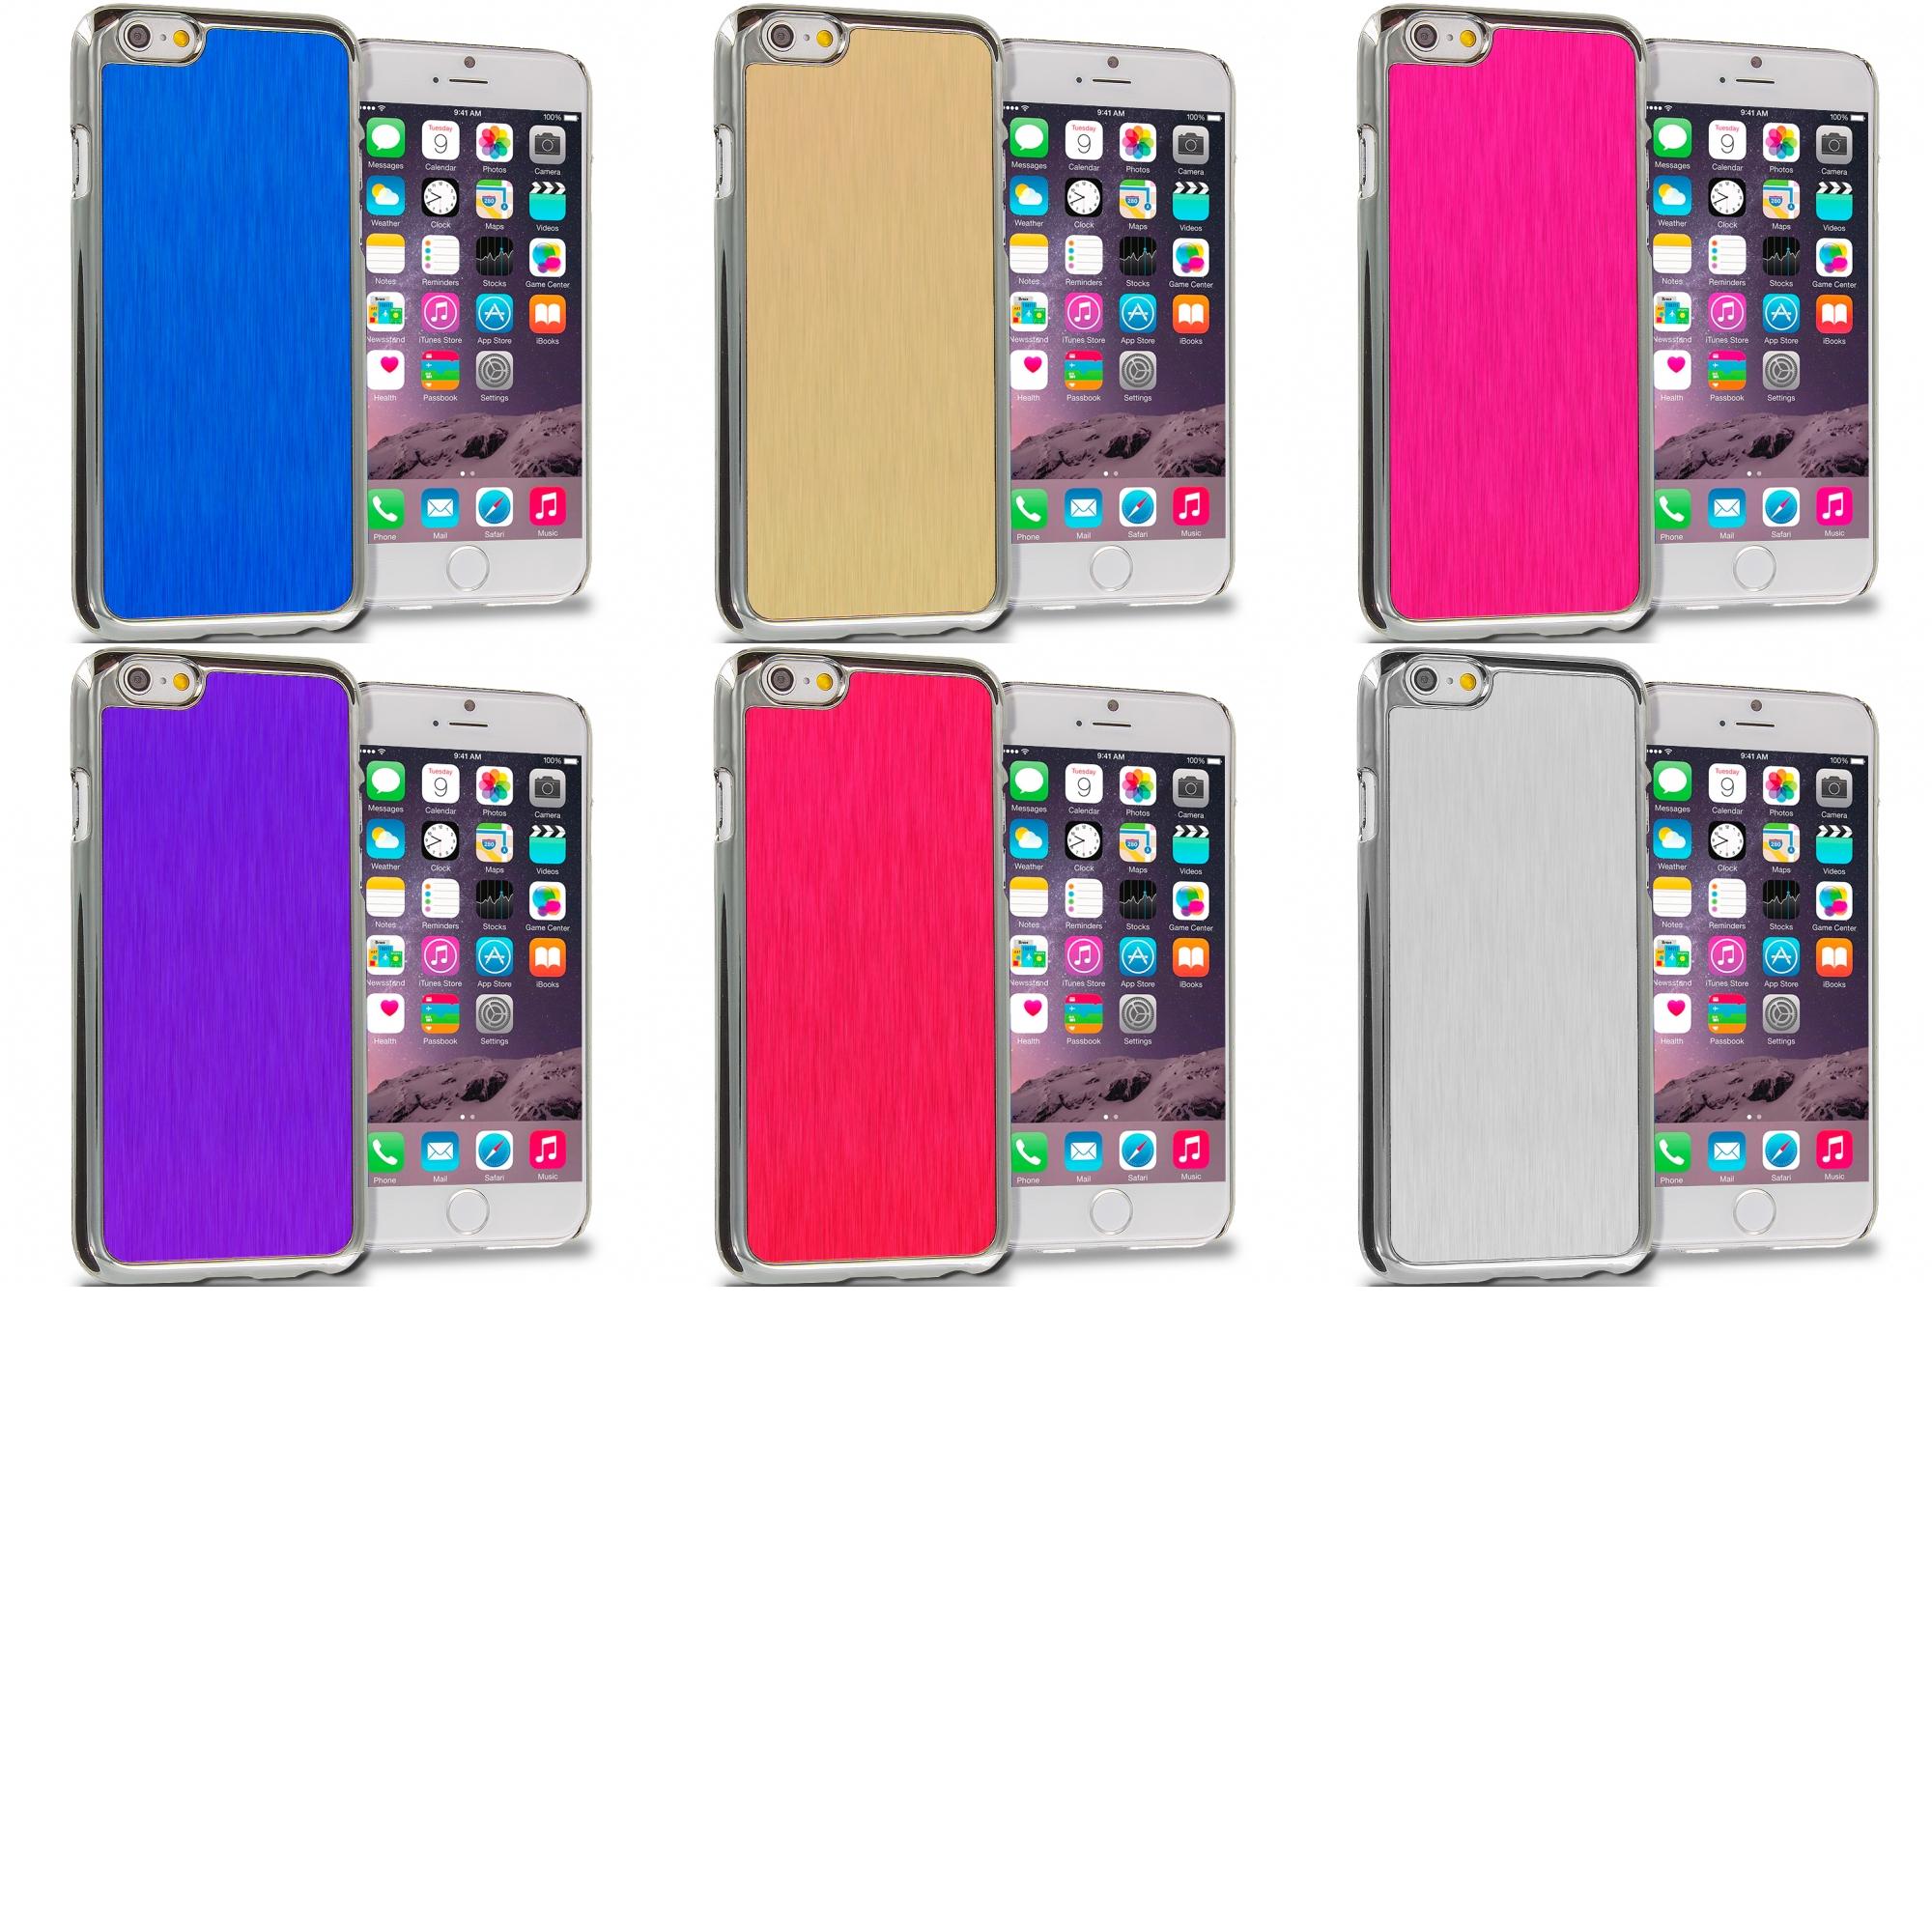 Apple iPhone 6 6 in 1 Bundle - Aluminum Metal Hard Case Cover